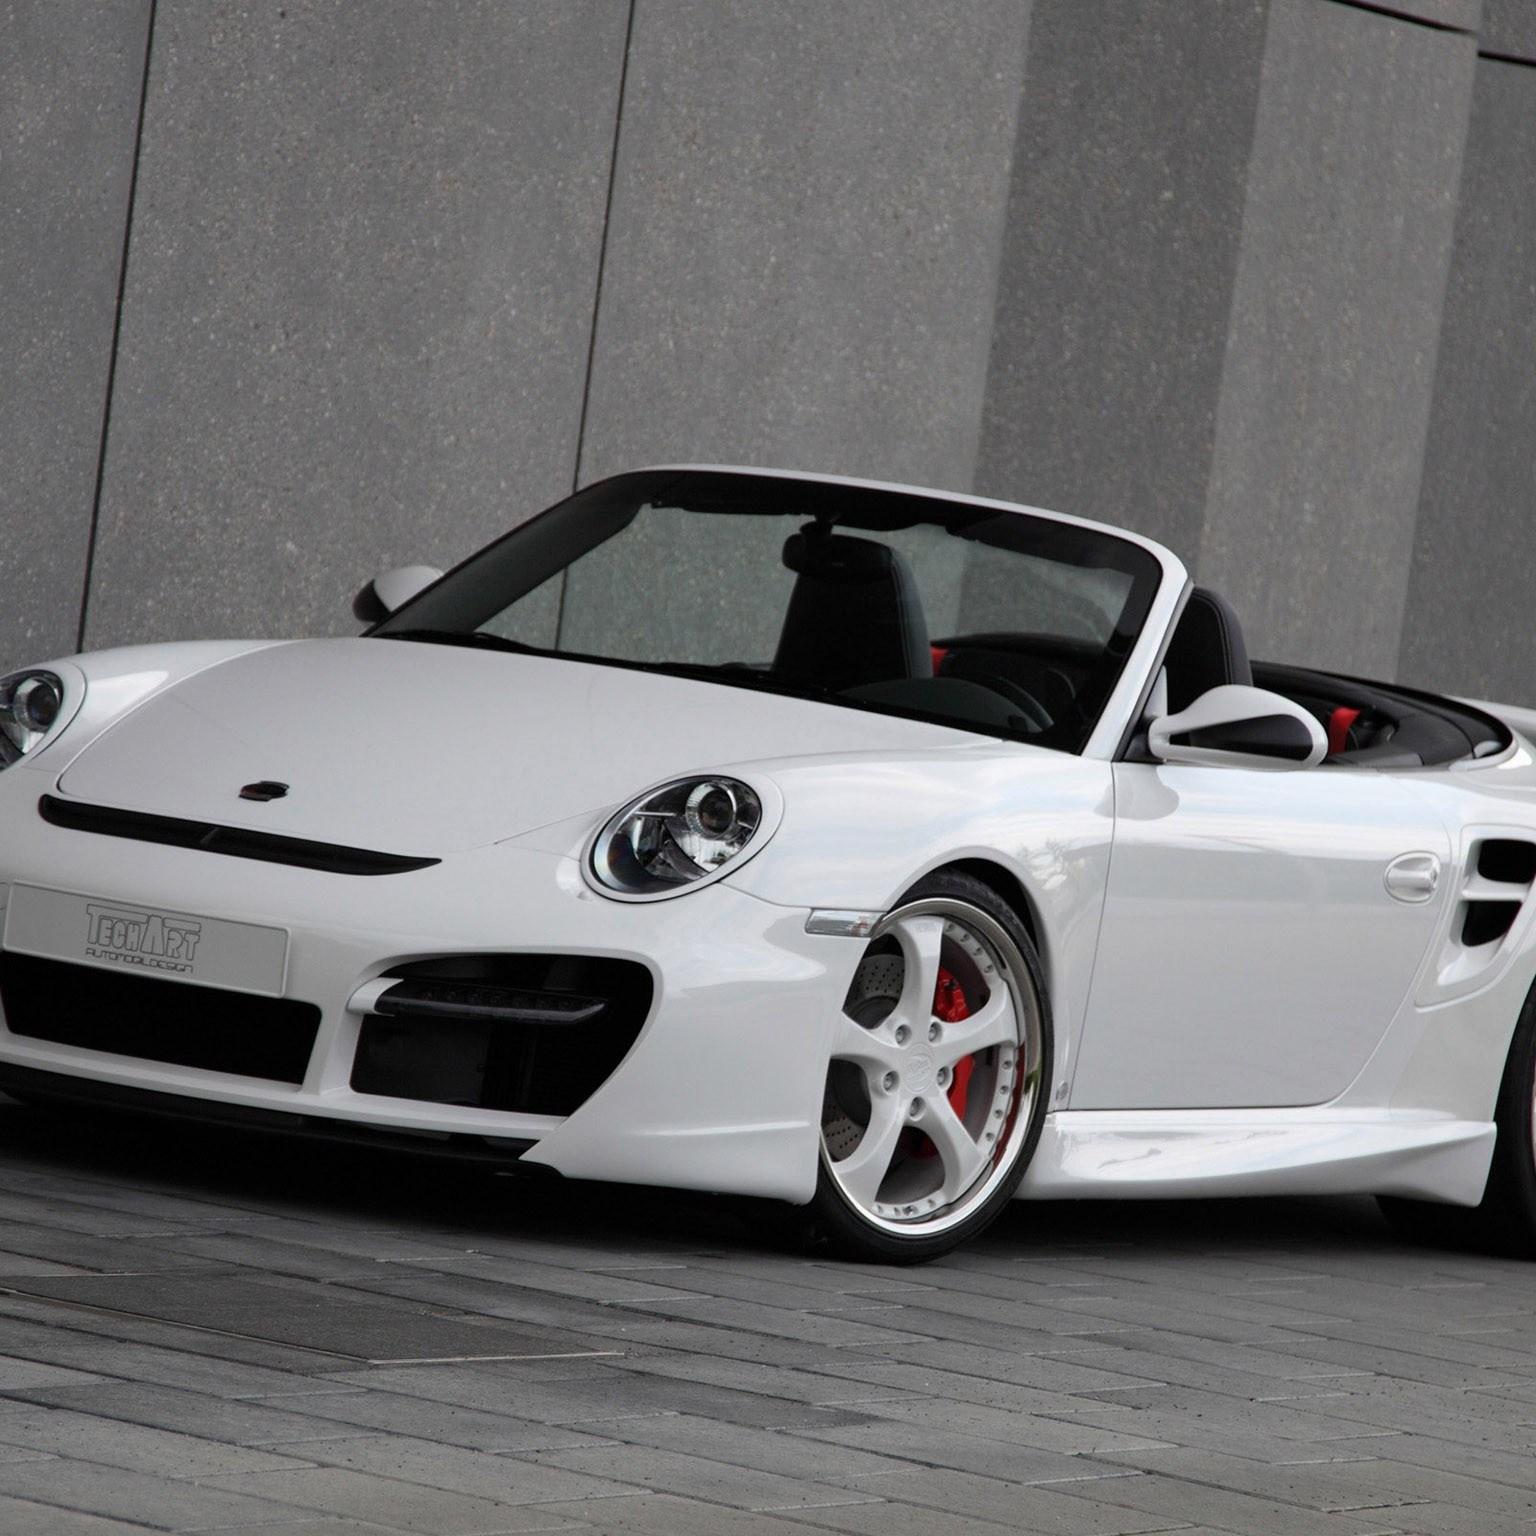 2010 Techart Porsche 911 Cabrio Turbo Aerokit II